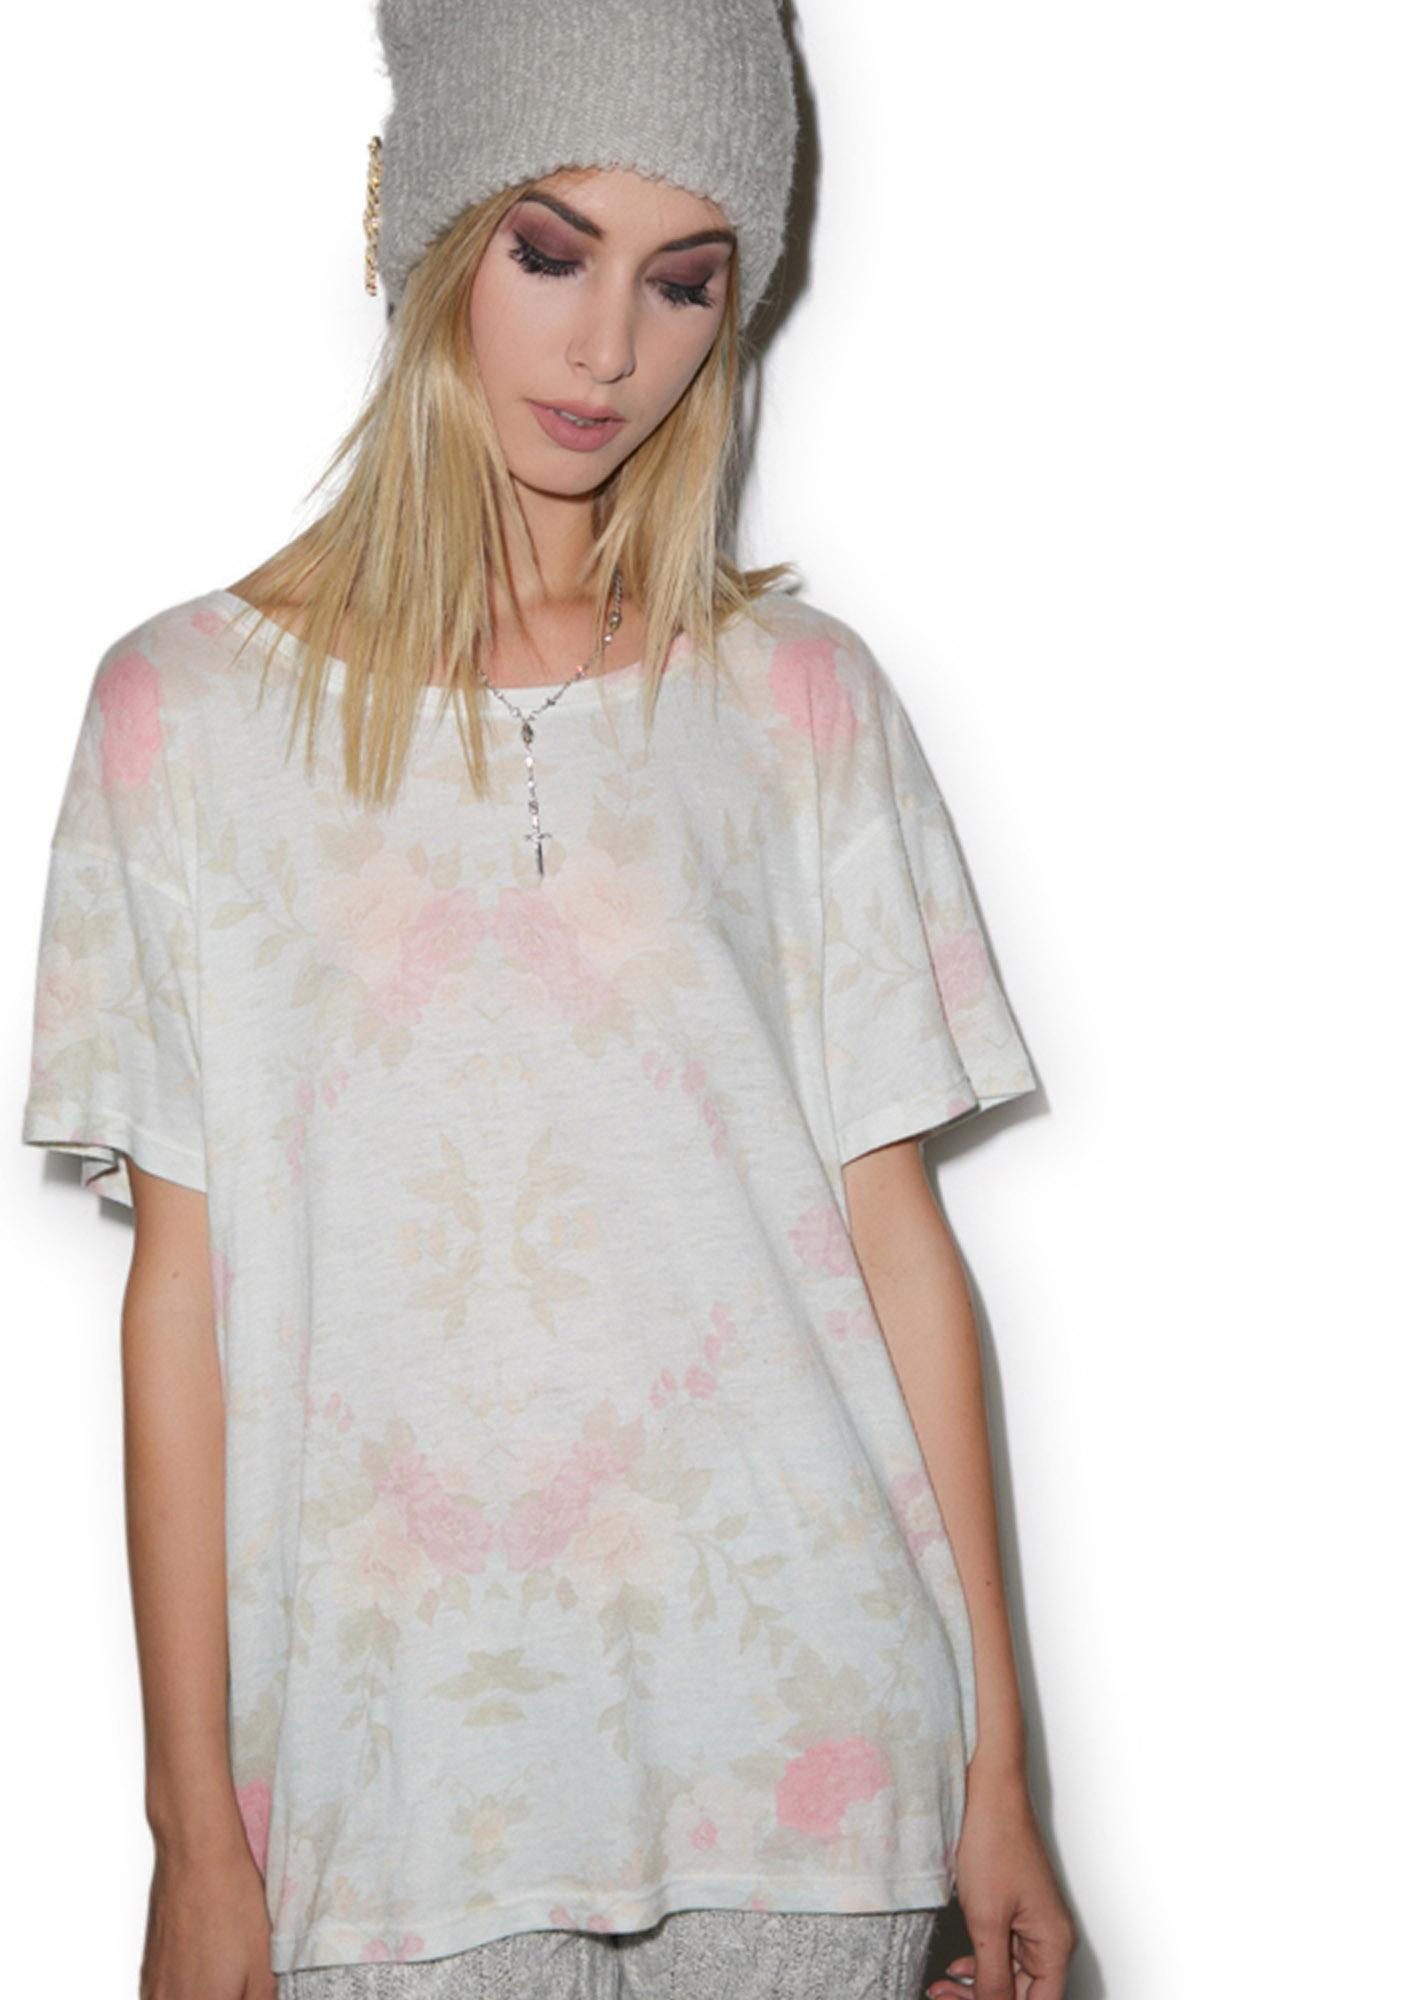 Wildfox Couture Austen Rose Unisex Tee